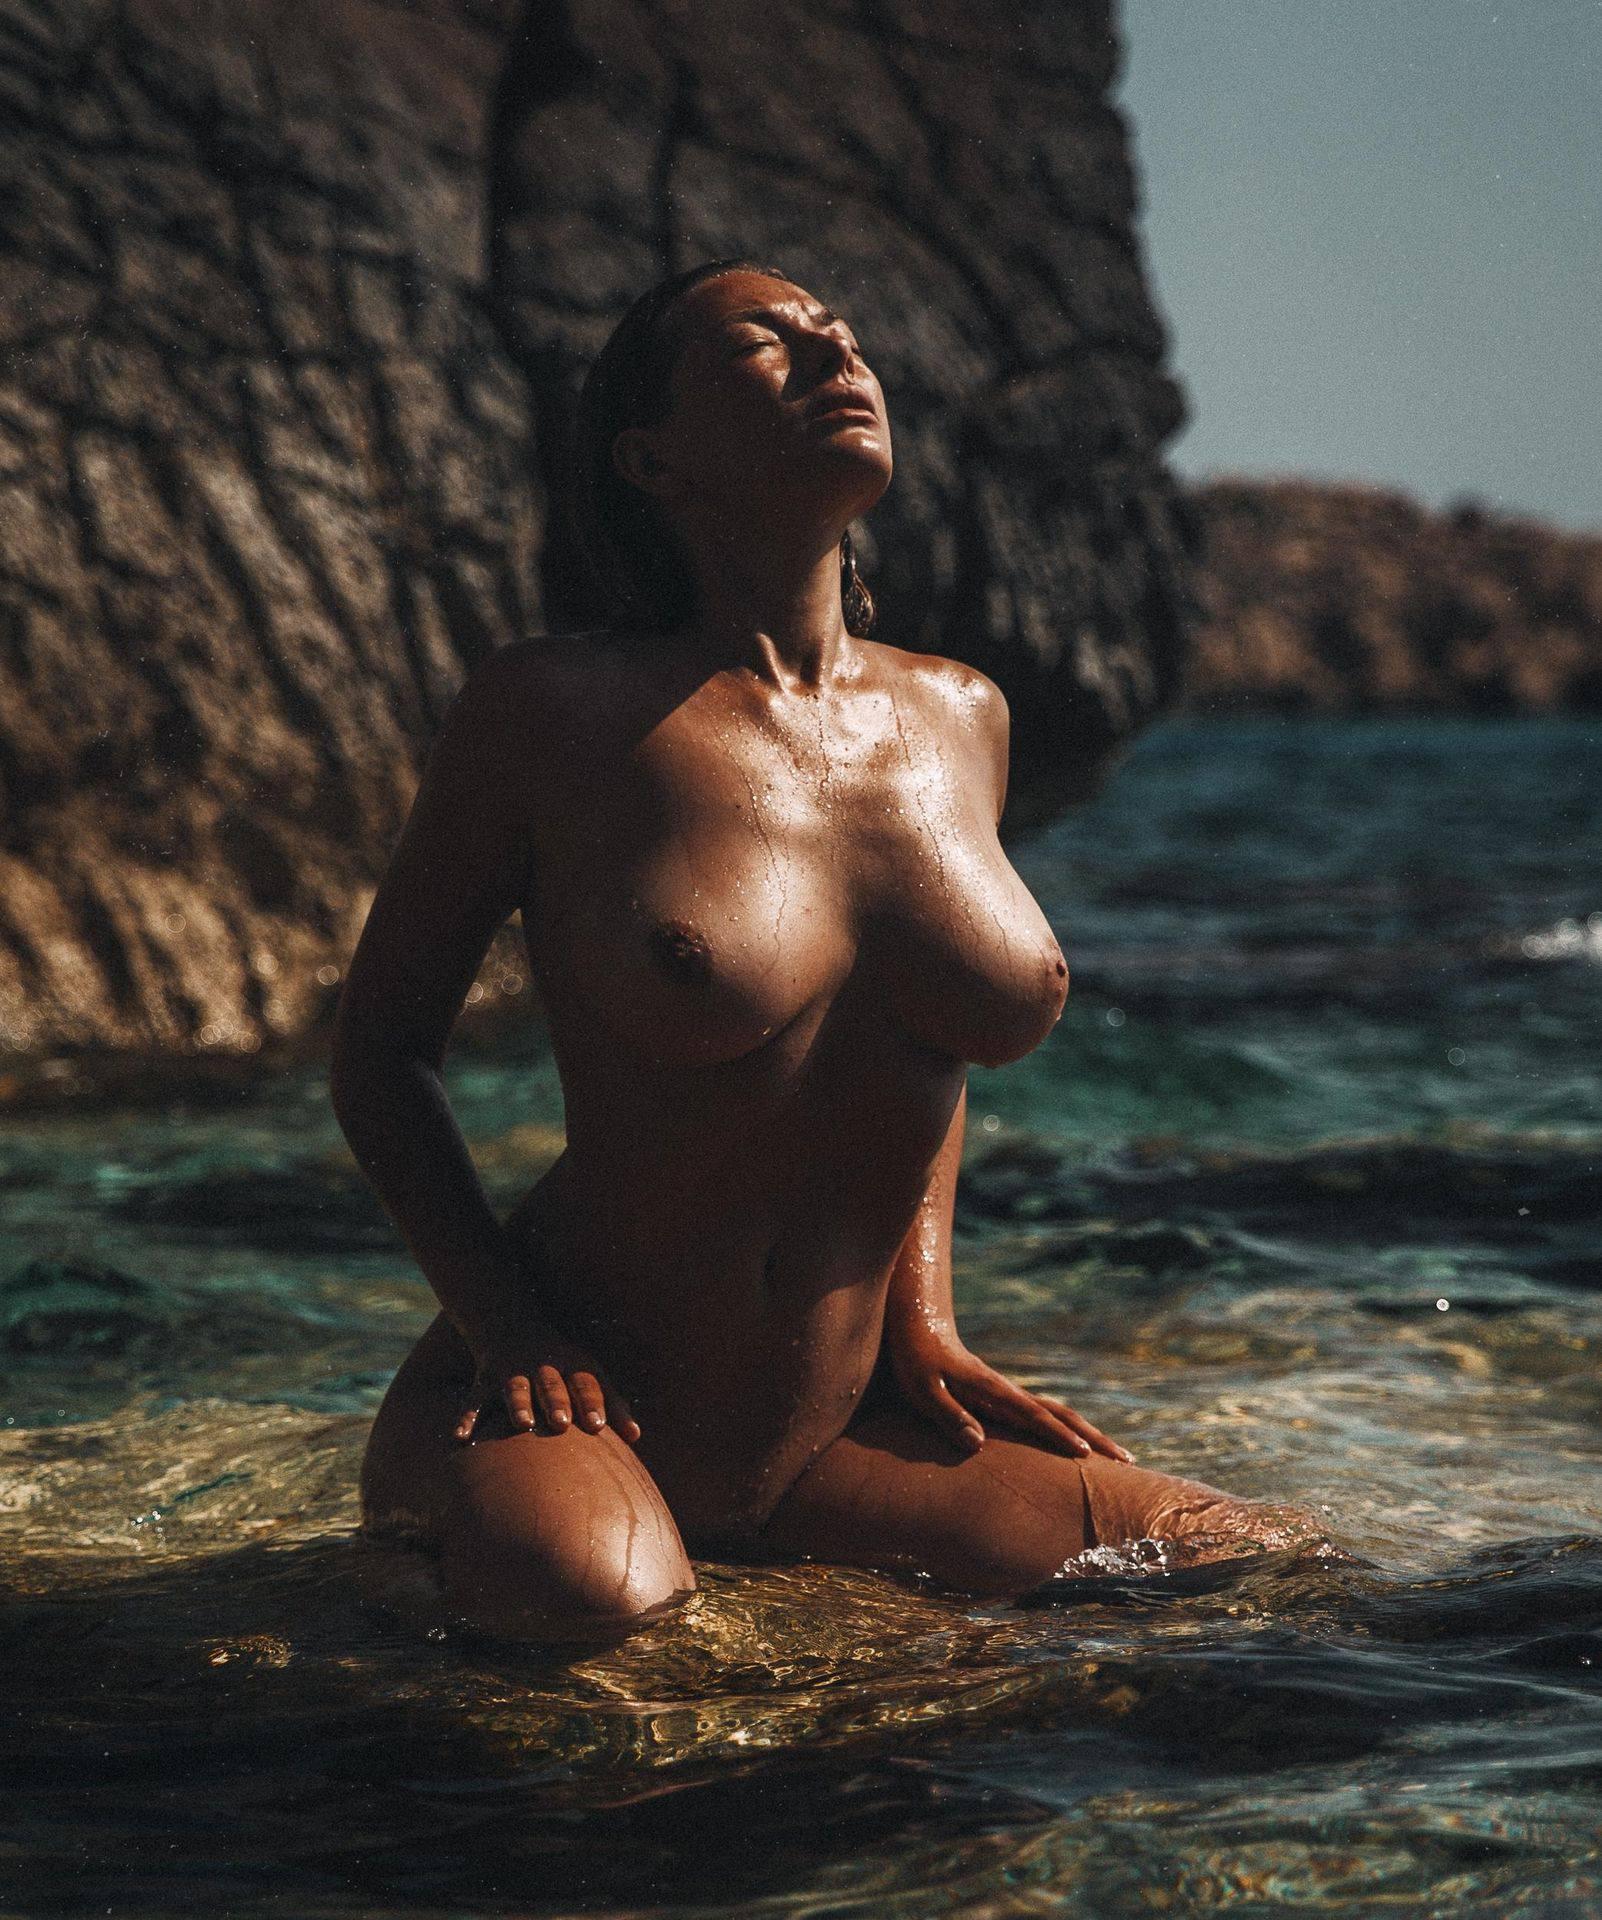 Olga Kobzar – Hot Big Boobs In Sexy Full Frontal Nude Photoshoot By Thomas Agatz (nsfw) 0021